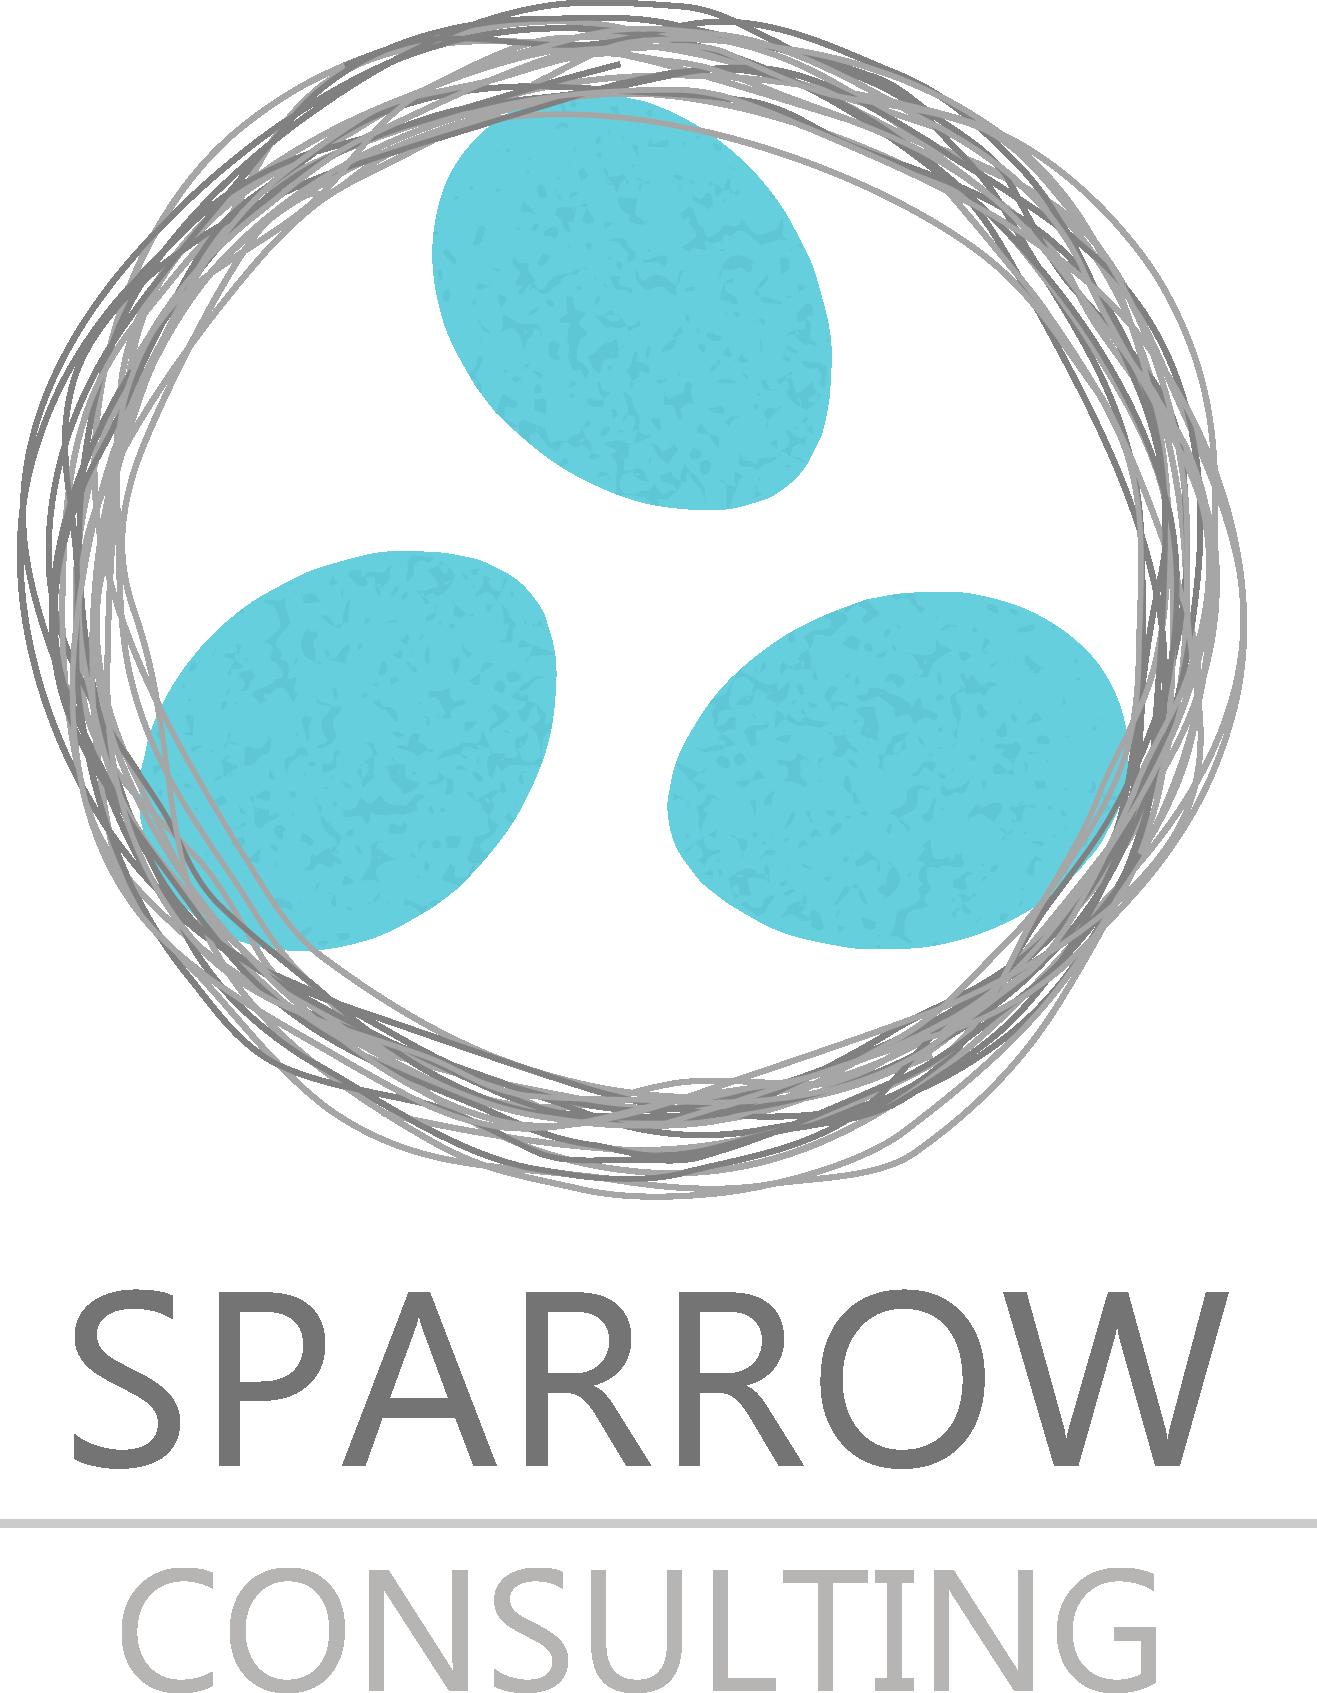 Nest clipart sparrow nest. S consulting llc